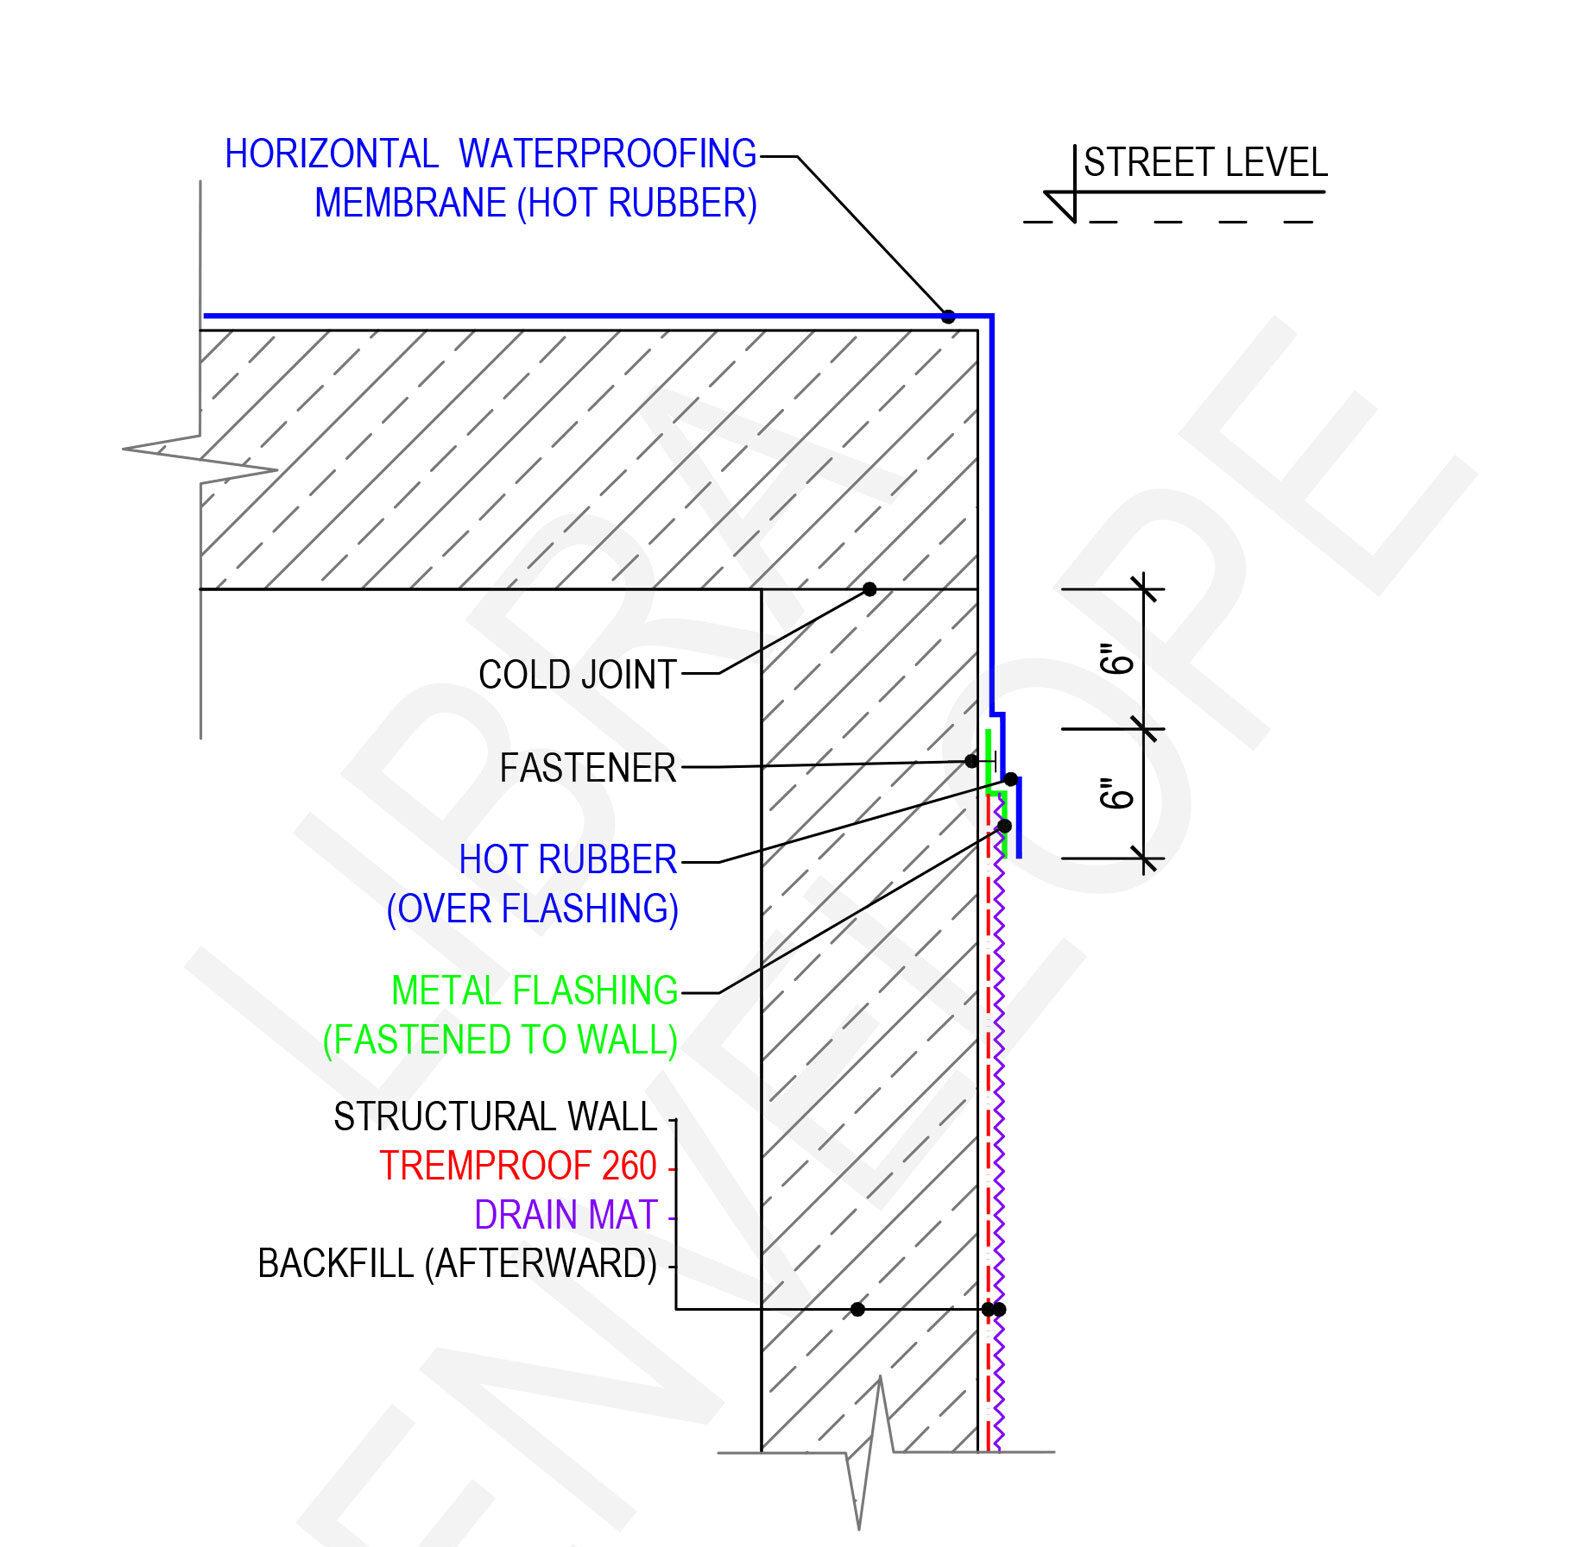 https://secureservercdn.net/166.62.110.60/qzv.773.myftpupload.com/wp-content/uploads/2021/04/roofing_design_waterproofing-e1619640867199.jpg?time=1634800504